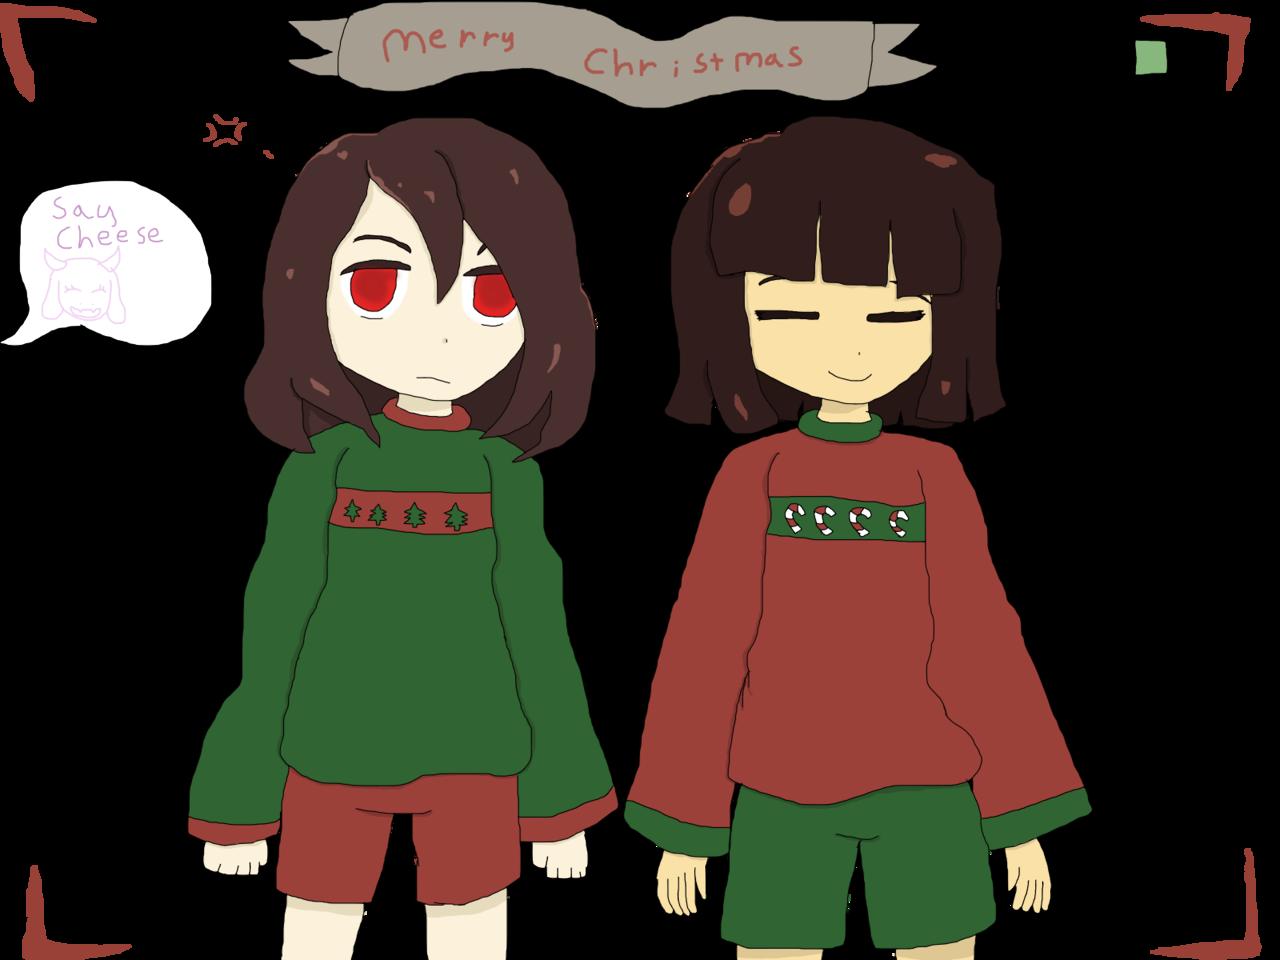 Undertale Christmas.Undertale Christmas 2strawberry4you Illustrations Art